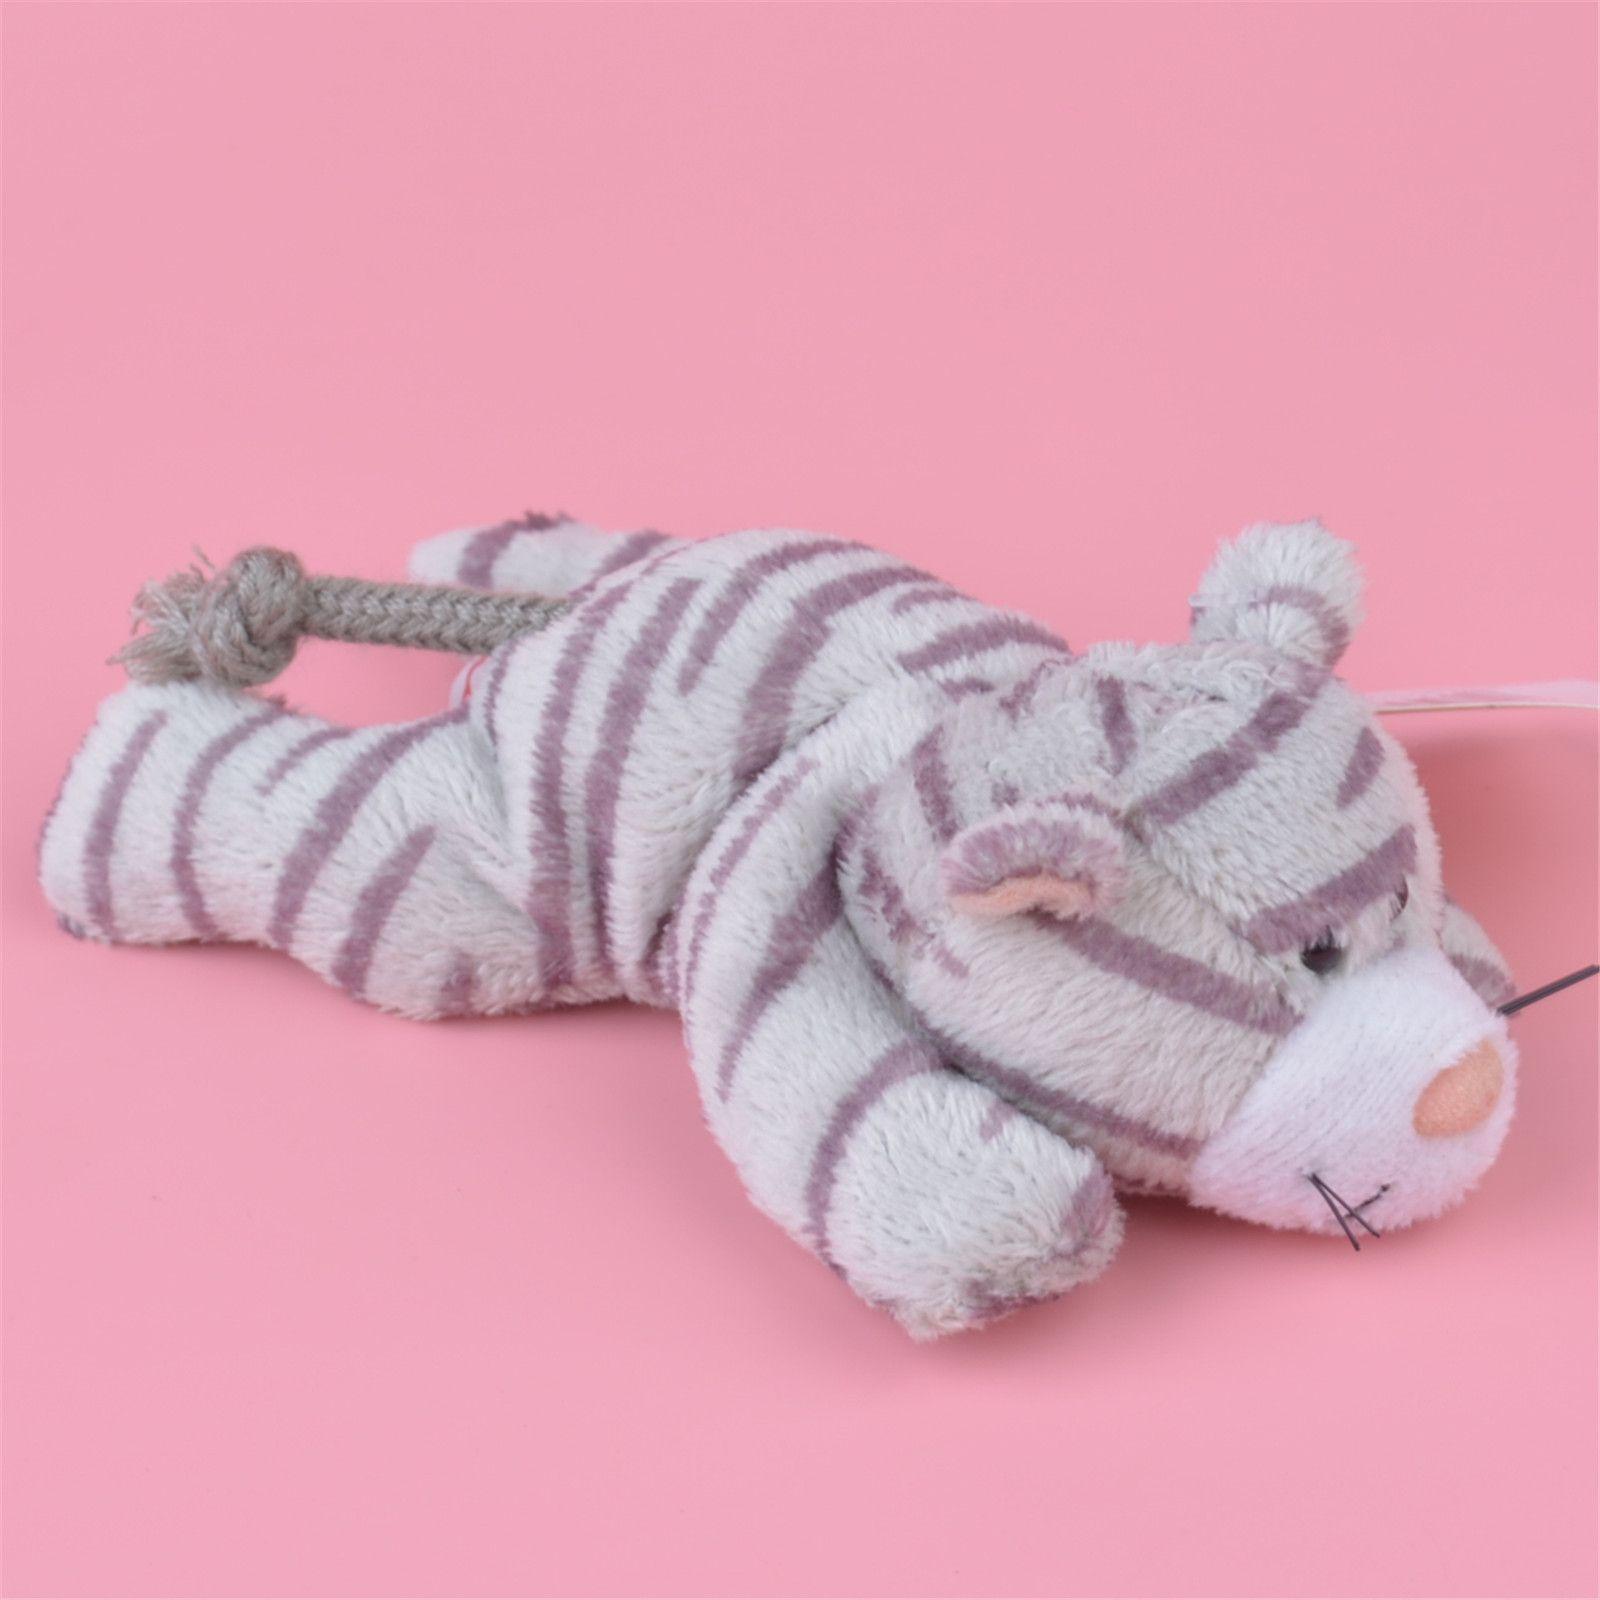 2019 Wholesale Brand New 10cm Forest Tiger Stuffed Animals Plush